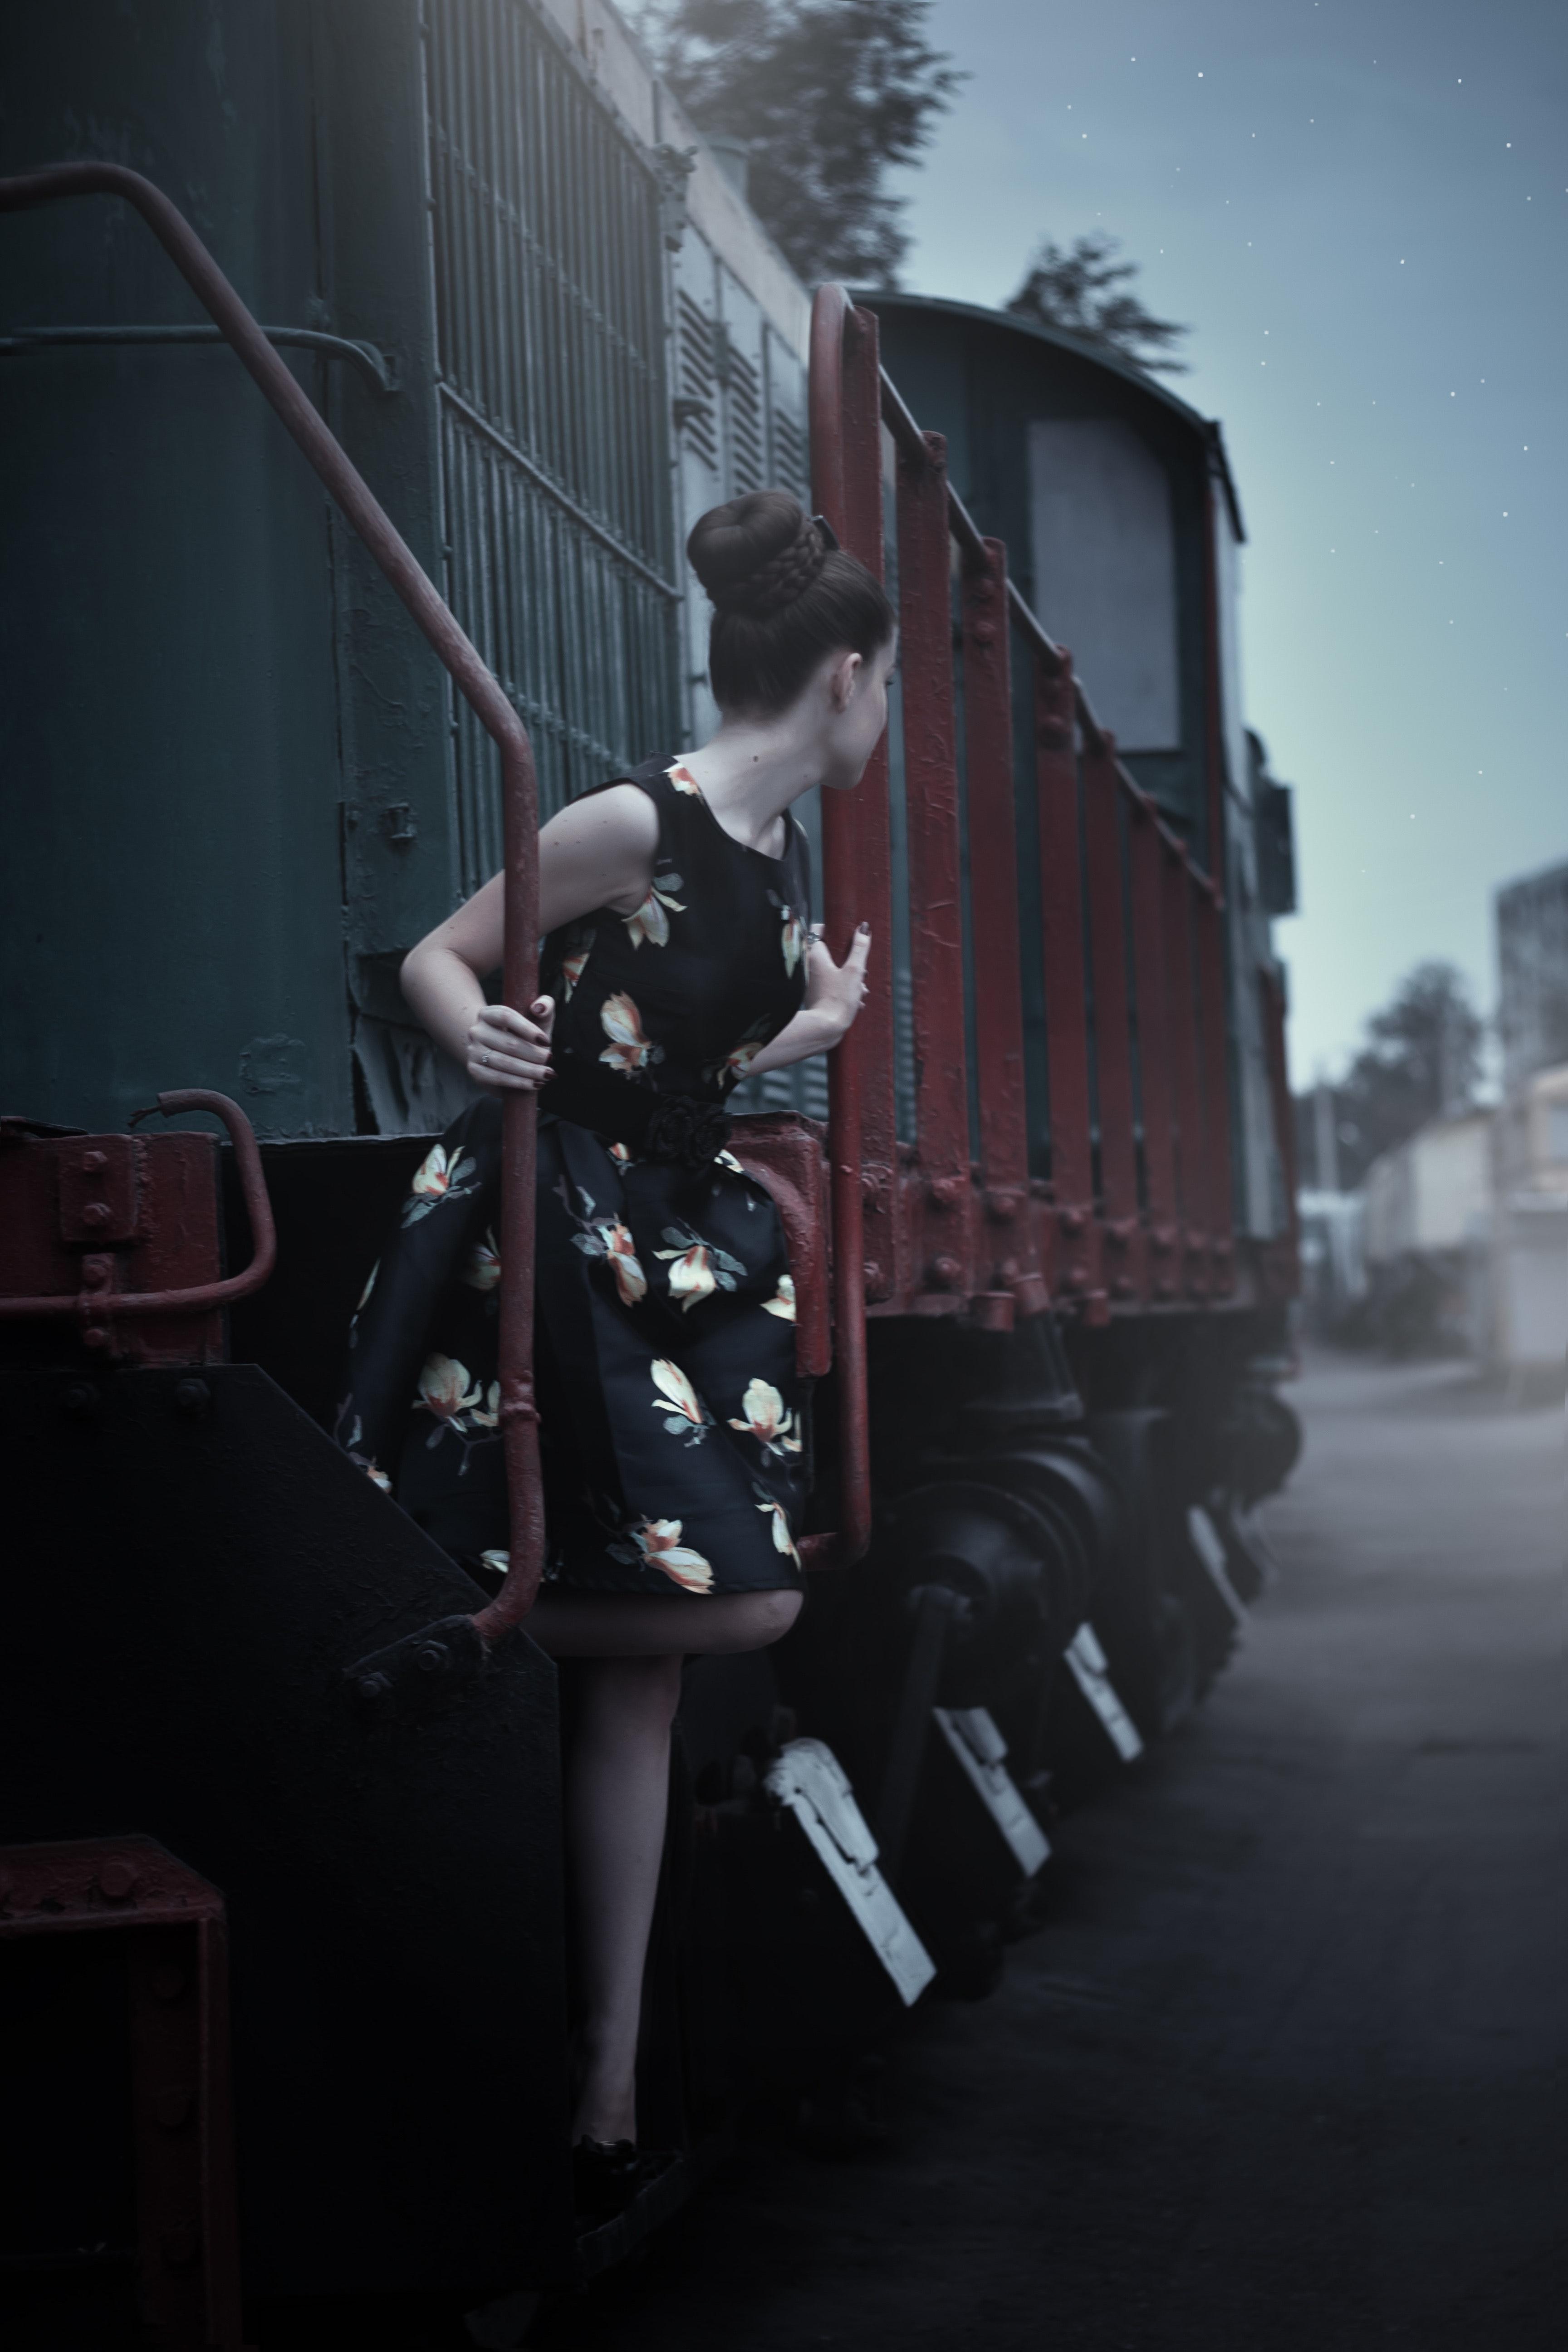 Woman in black sleeveless dress standing beside train photo